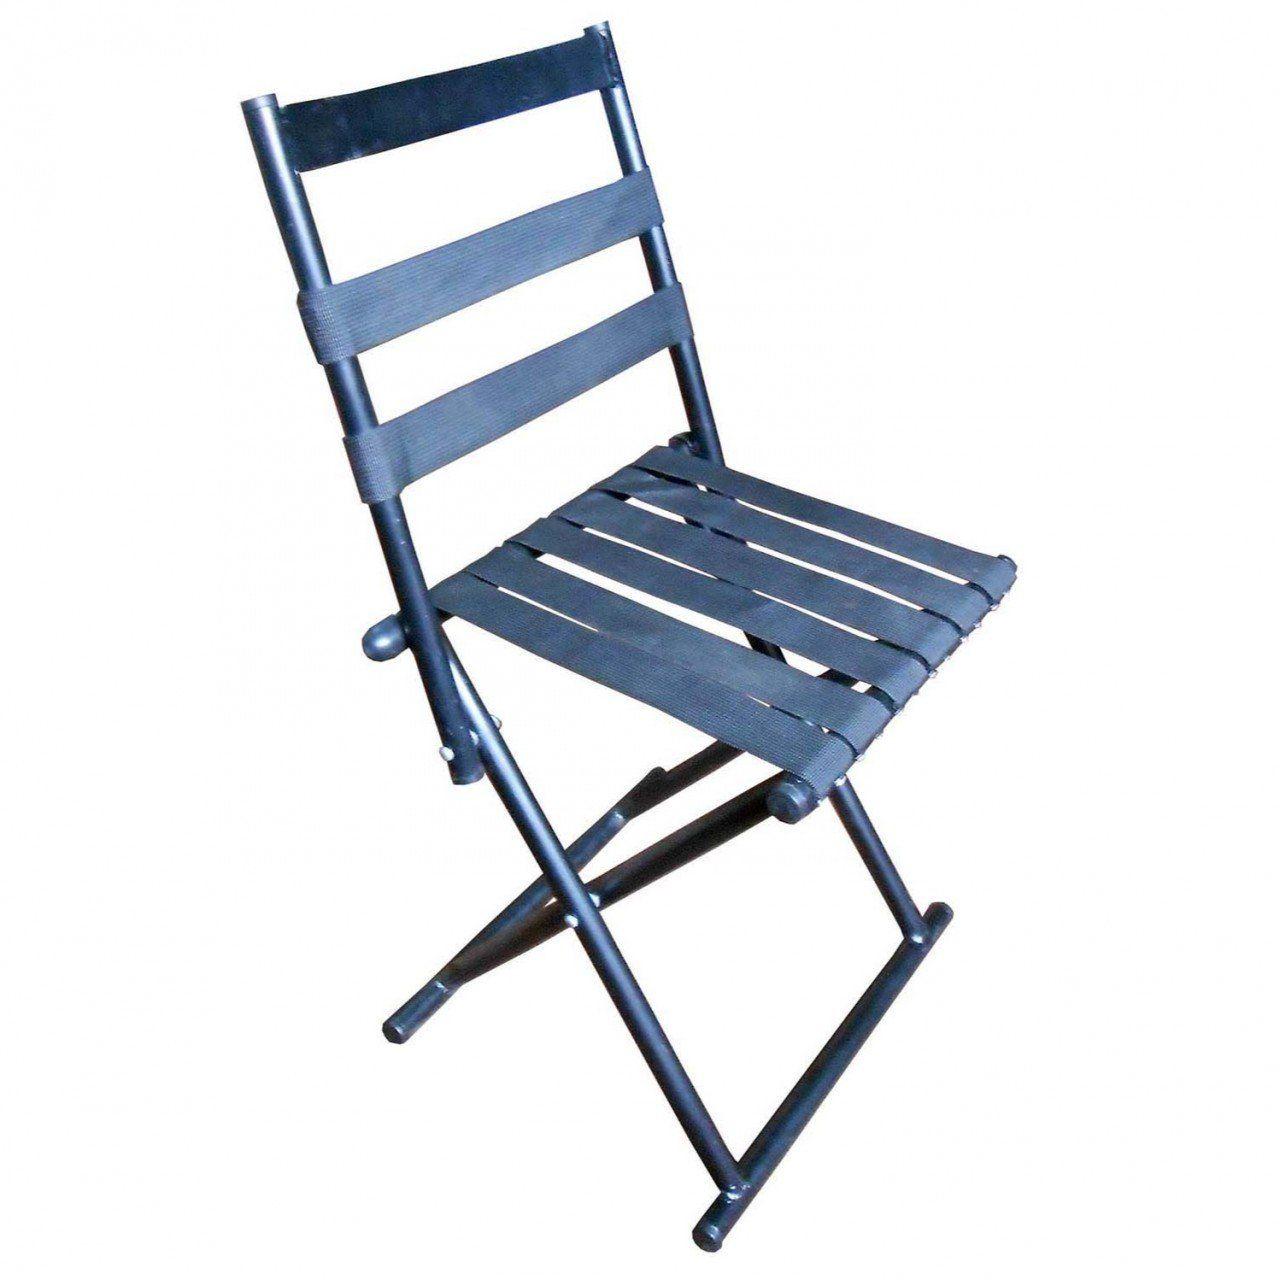 Folding Chair Mini Black Buy For Folding Chair Mini Black In Pakistan Folding Chair Outdoor Folding Chairs Chair